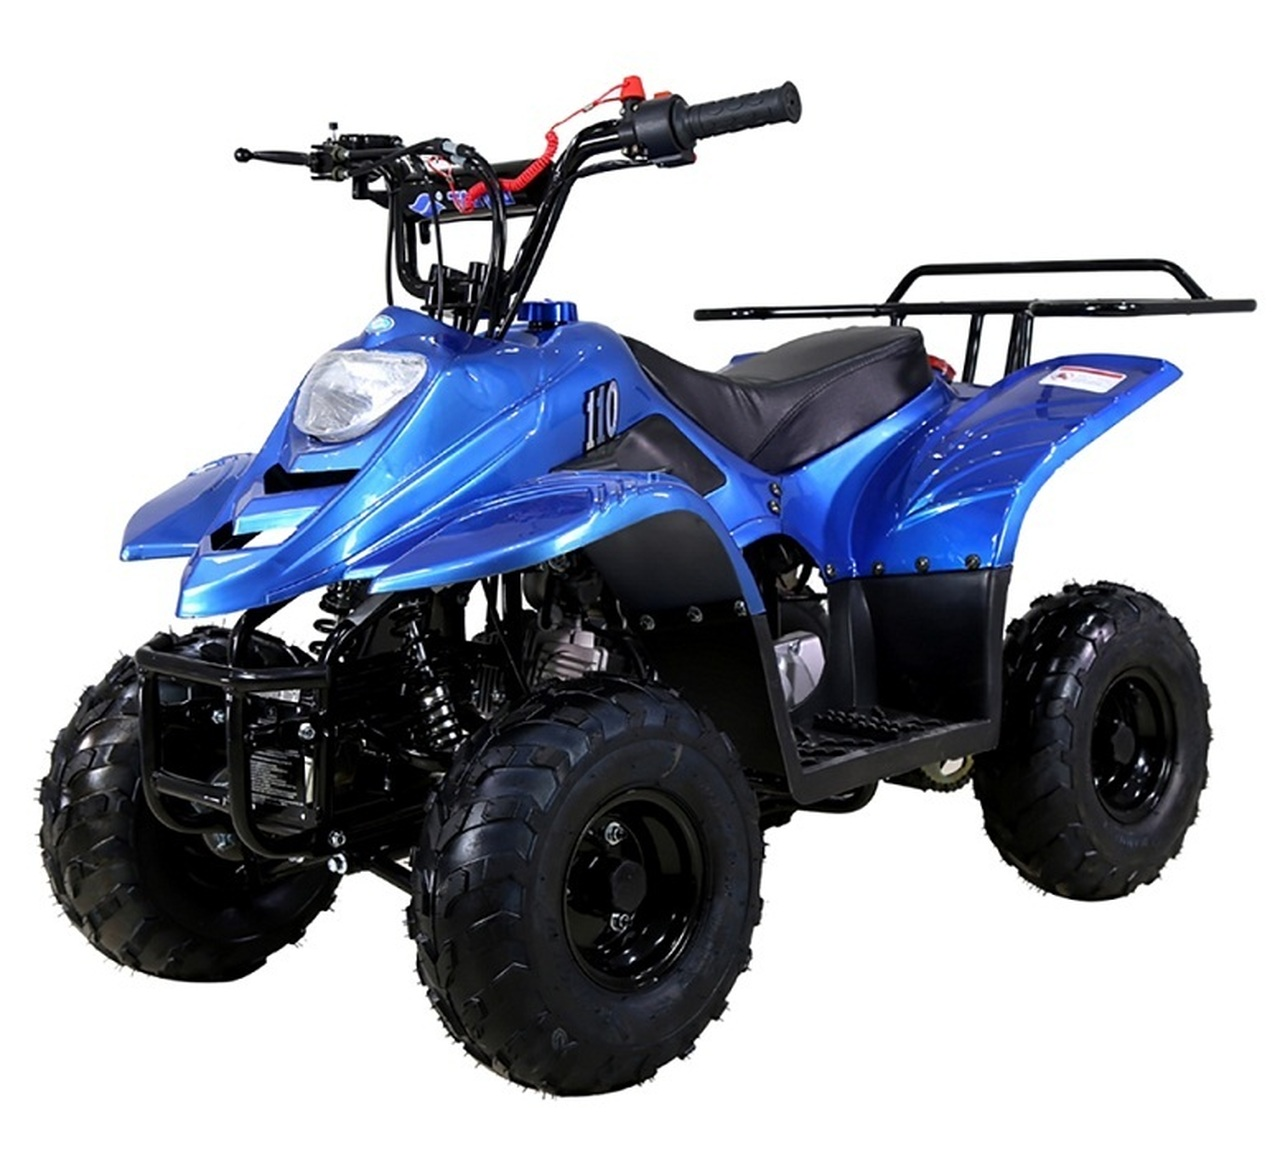 Taotao Boulder B1 ATV, 110CC Air cooled, 4-Stroke, 1-Cylinder, Automatic